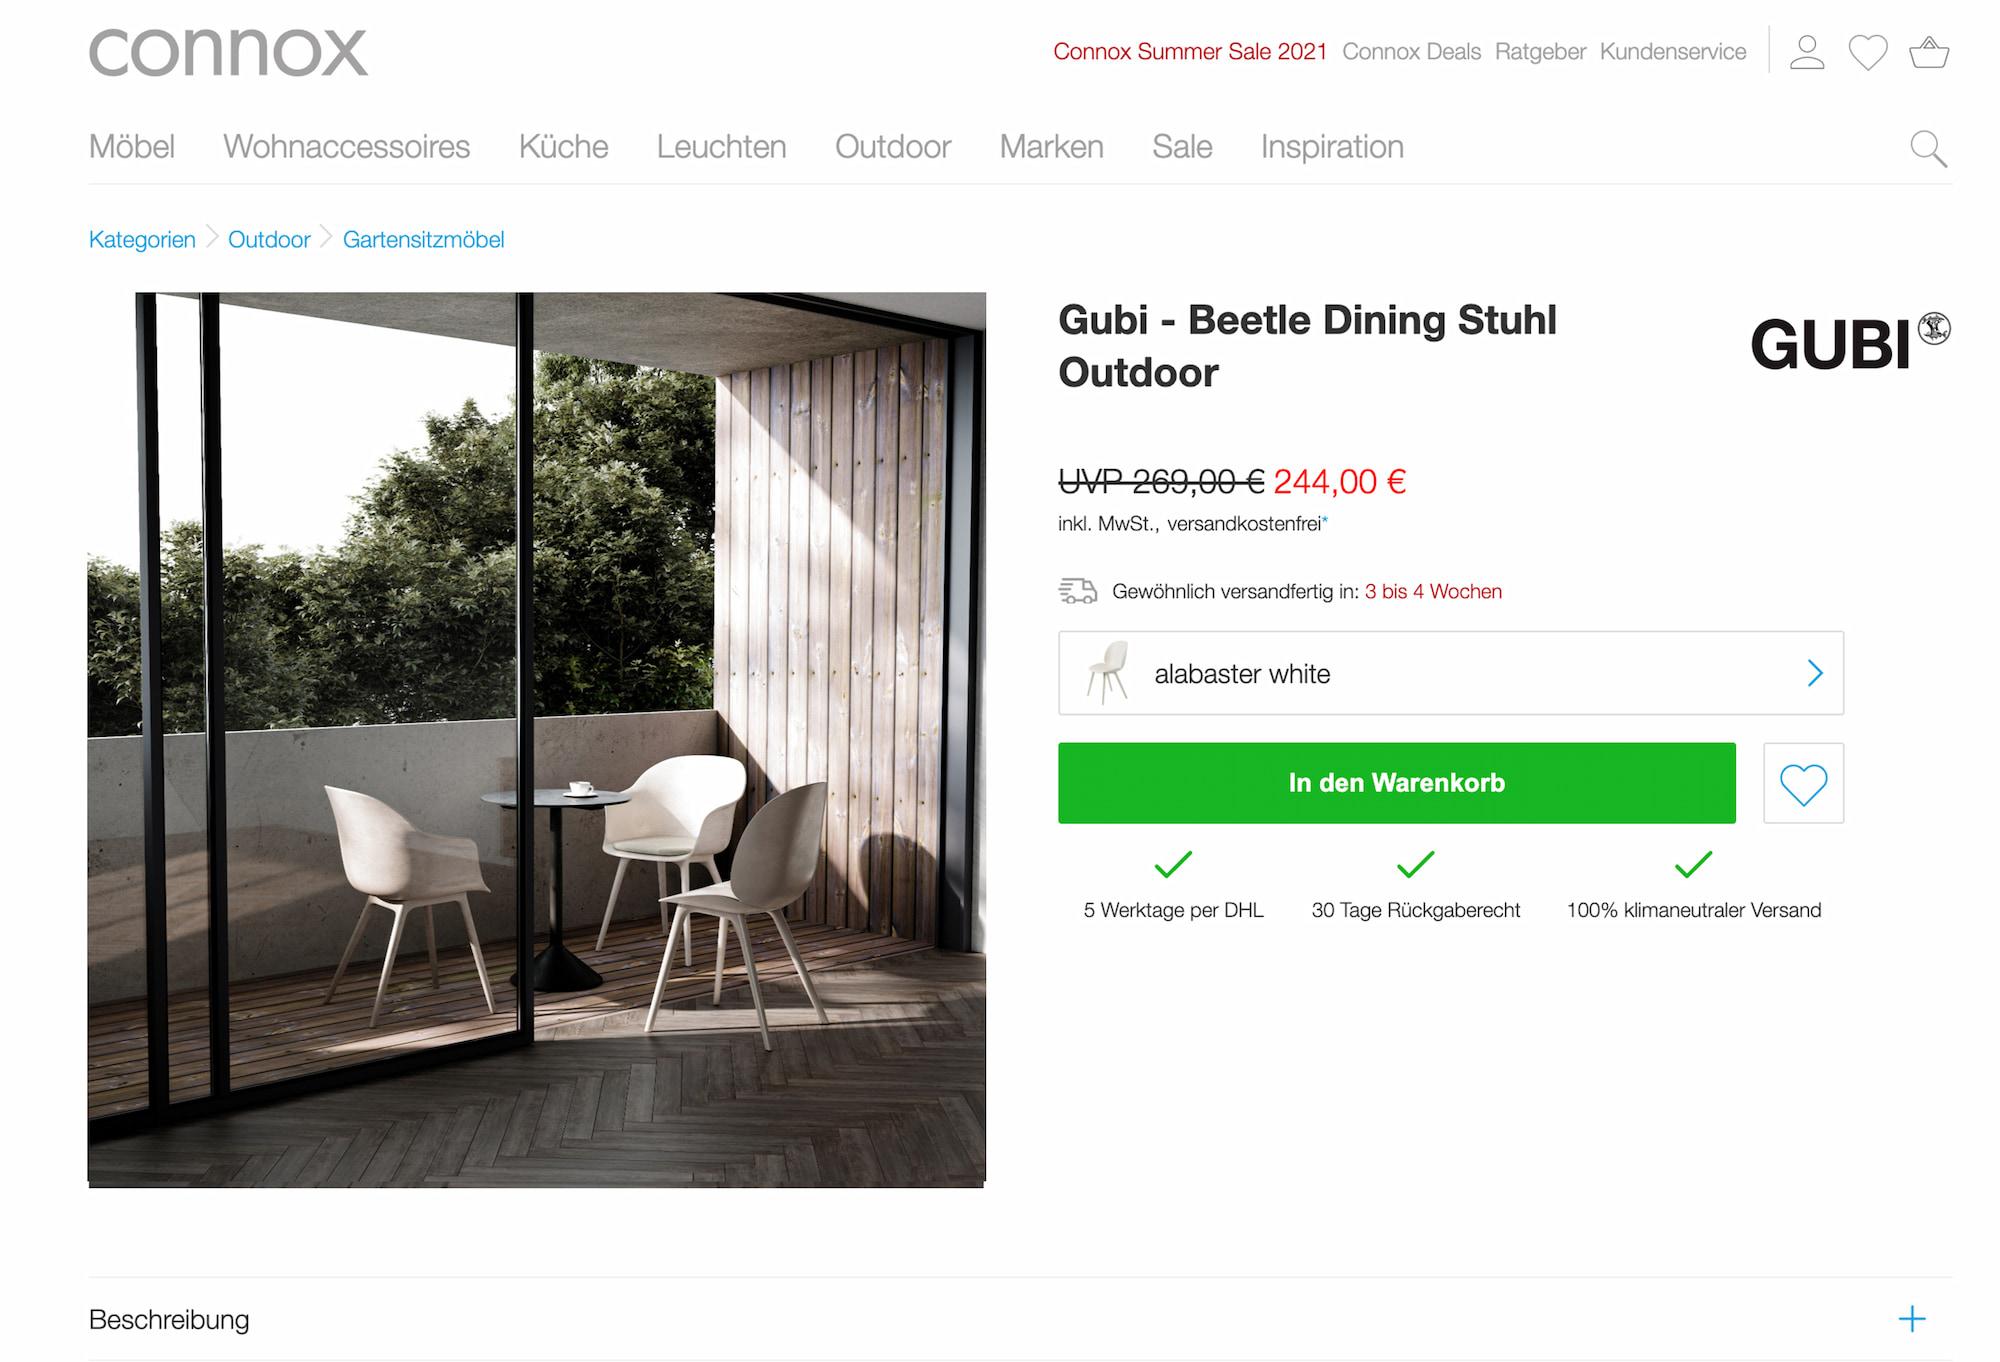 GUBI retailer Connox website